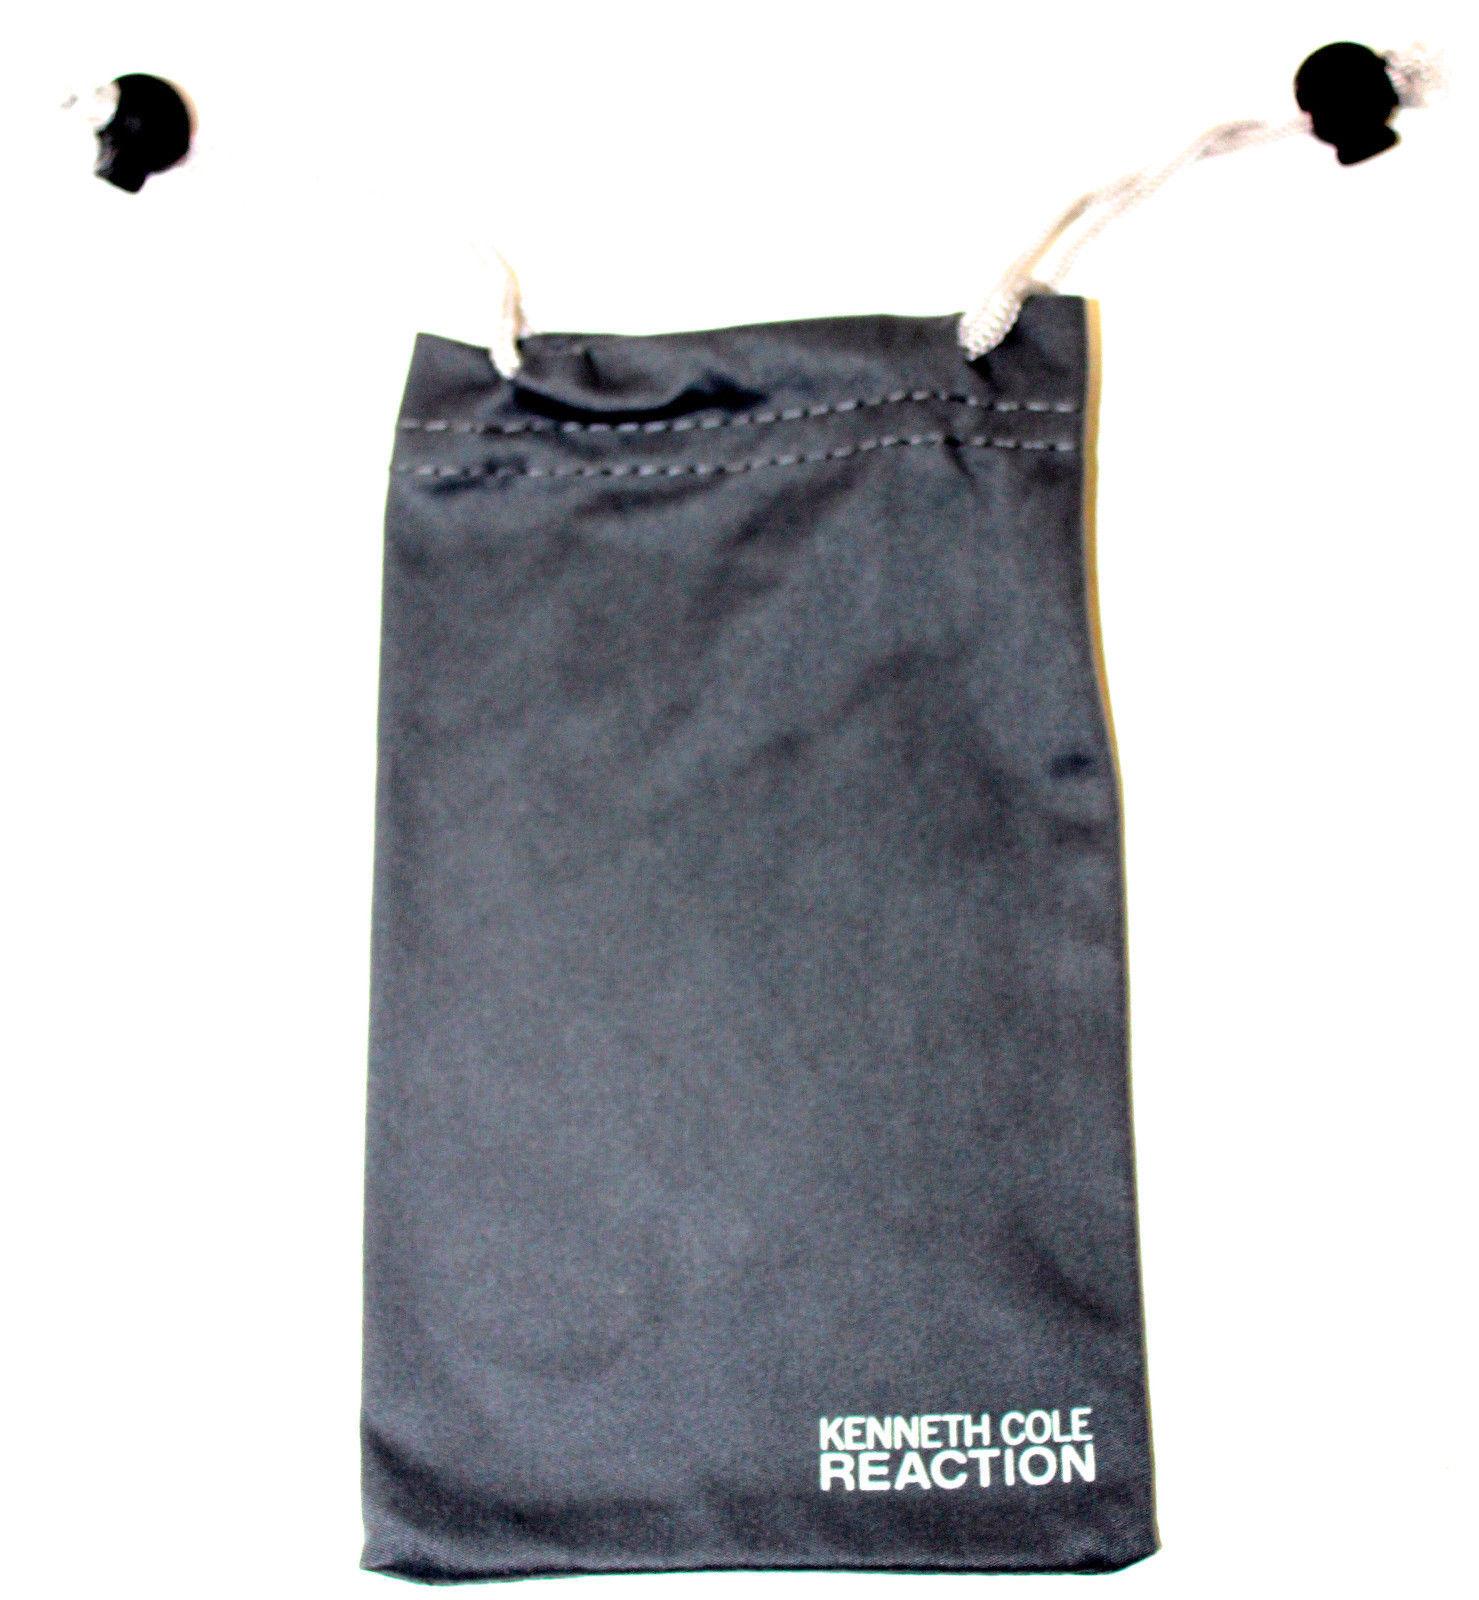 Kenneth Cole Reaction Mens Plastic Sunglass Black Fade, Gradient KC1290 5B image 6